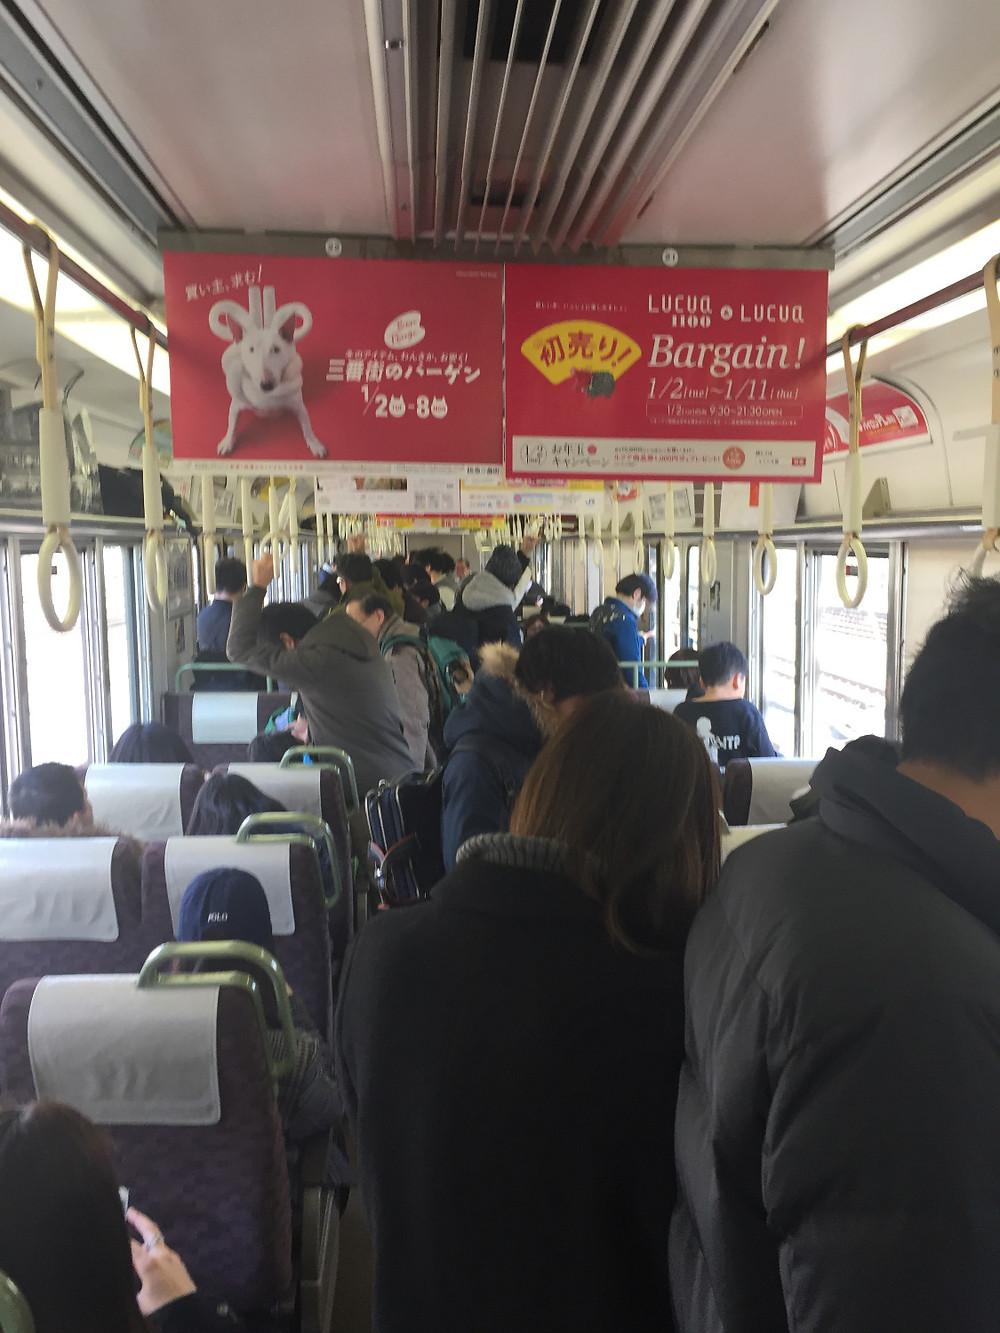 ads inside the train